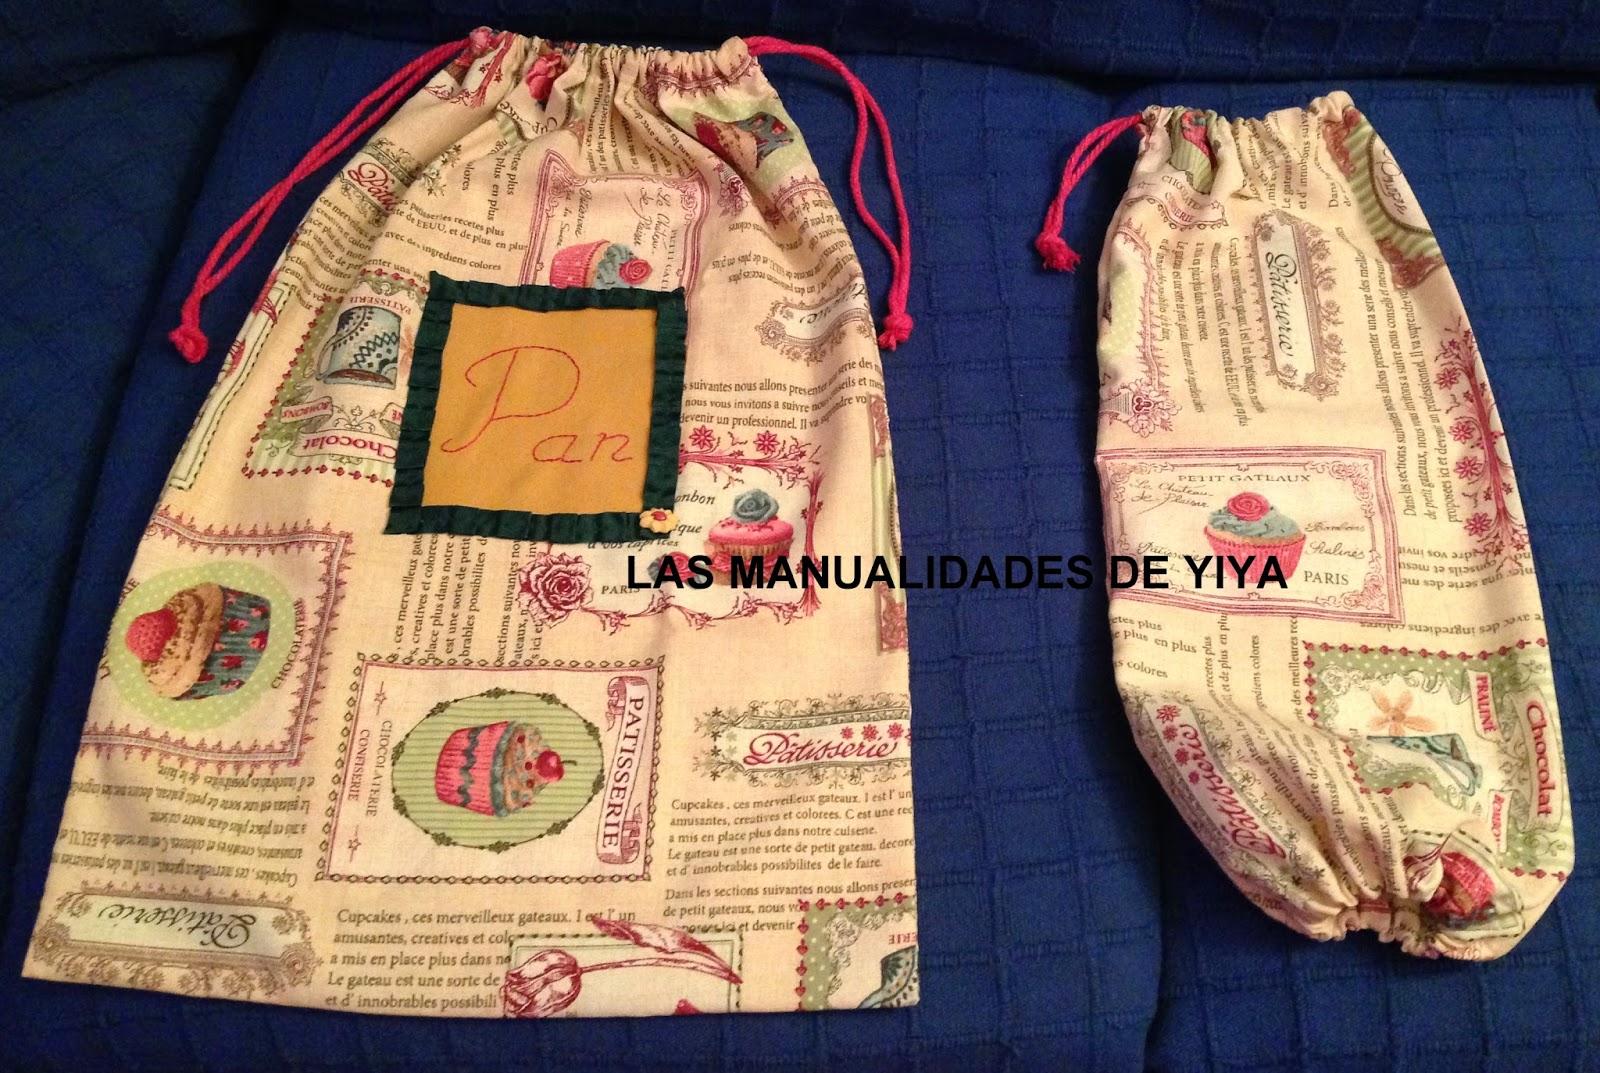 Las manualidades de yiya bolsa de tela hecha a mano para - Bolsas de tela manualidades ...